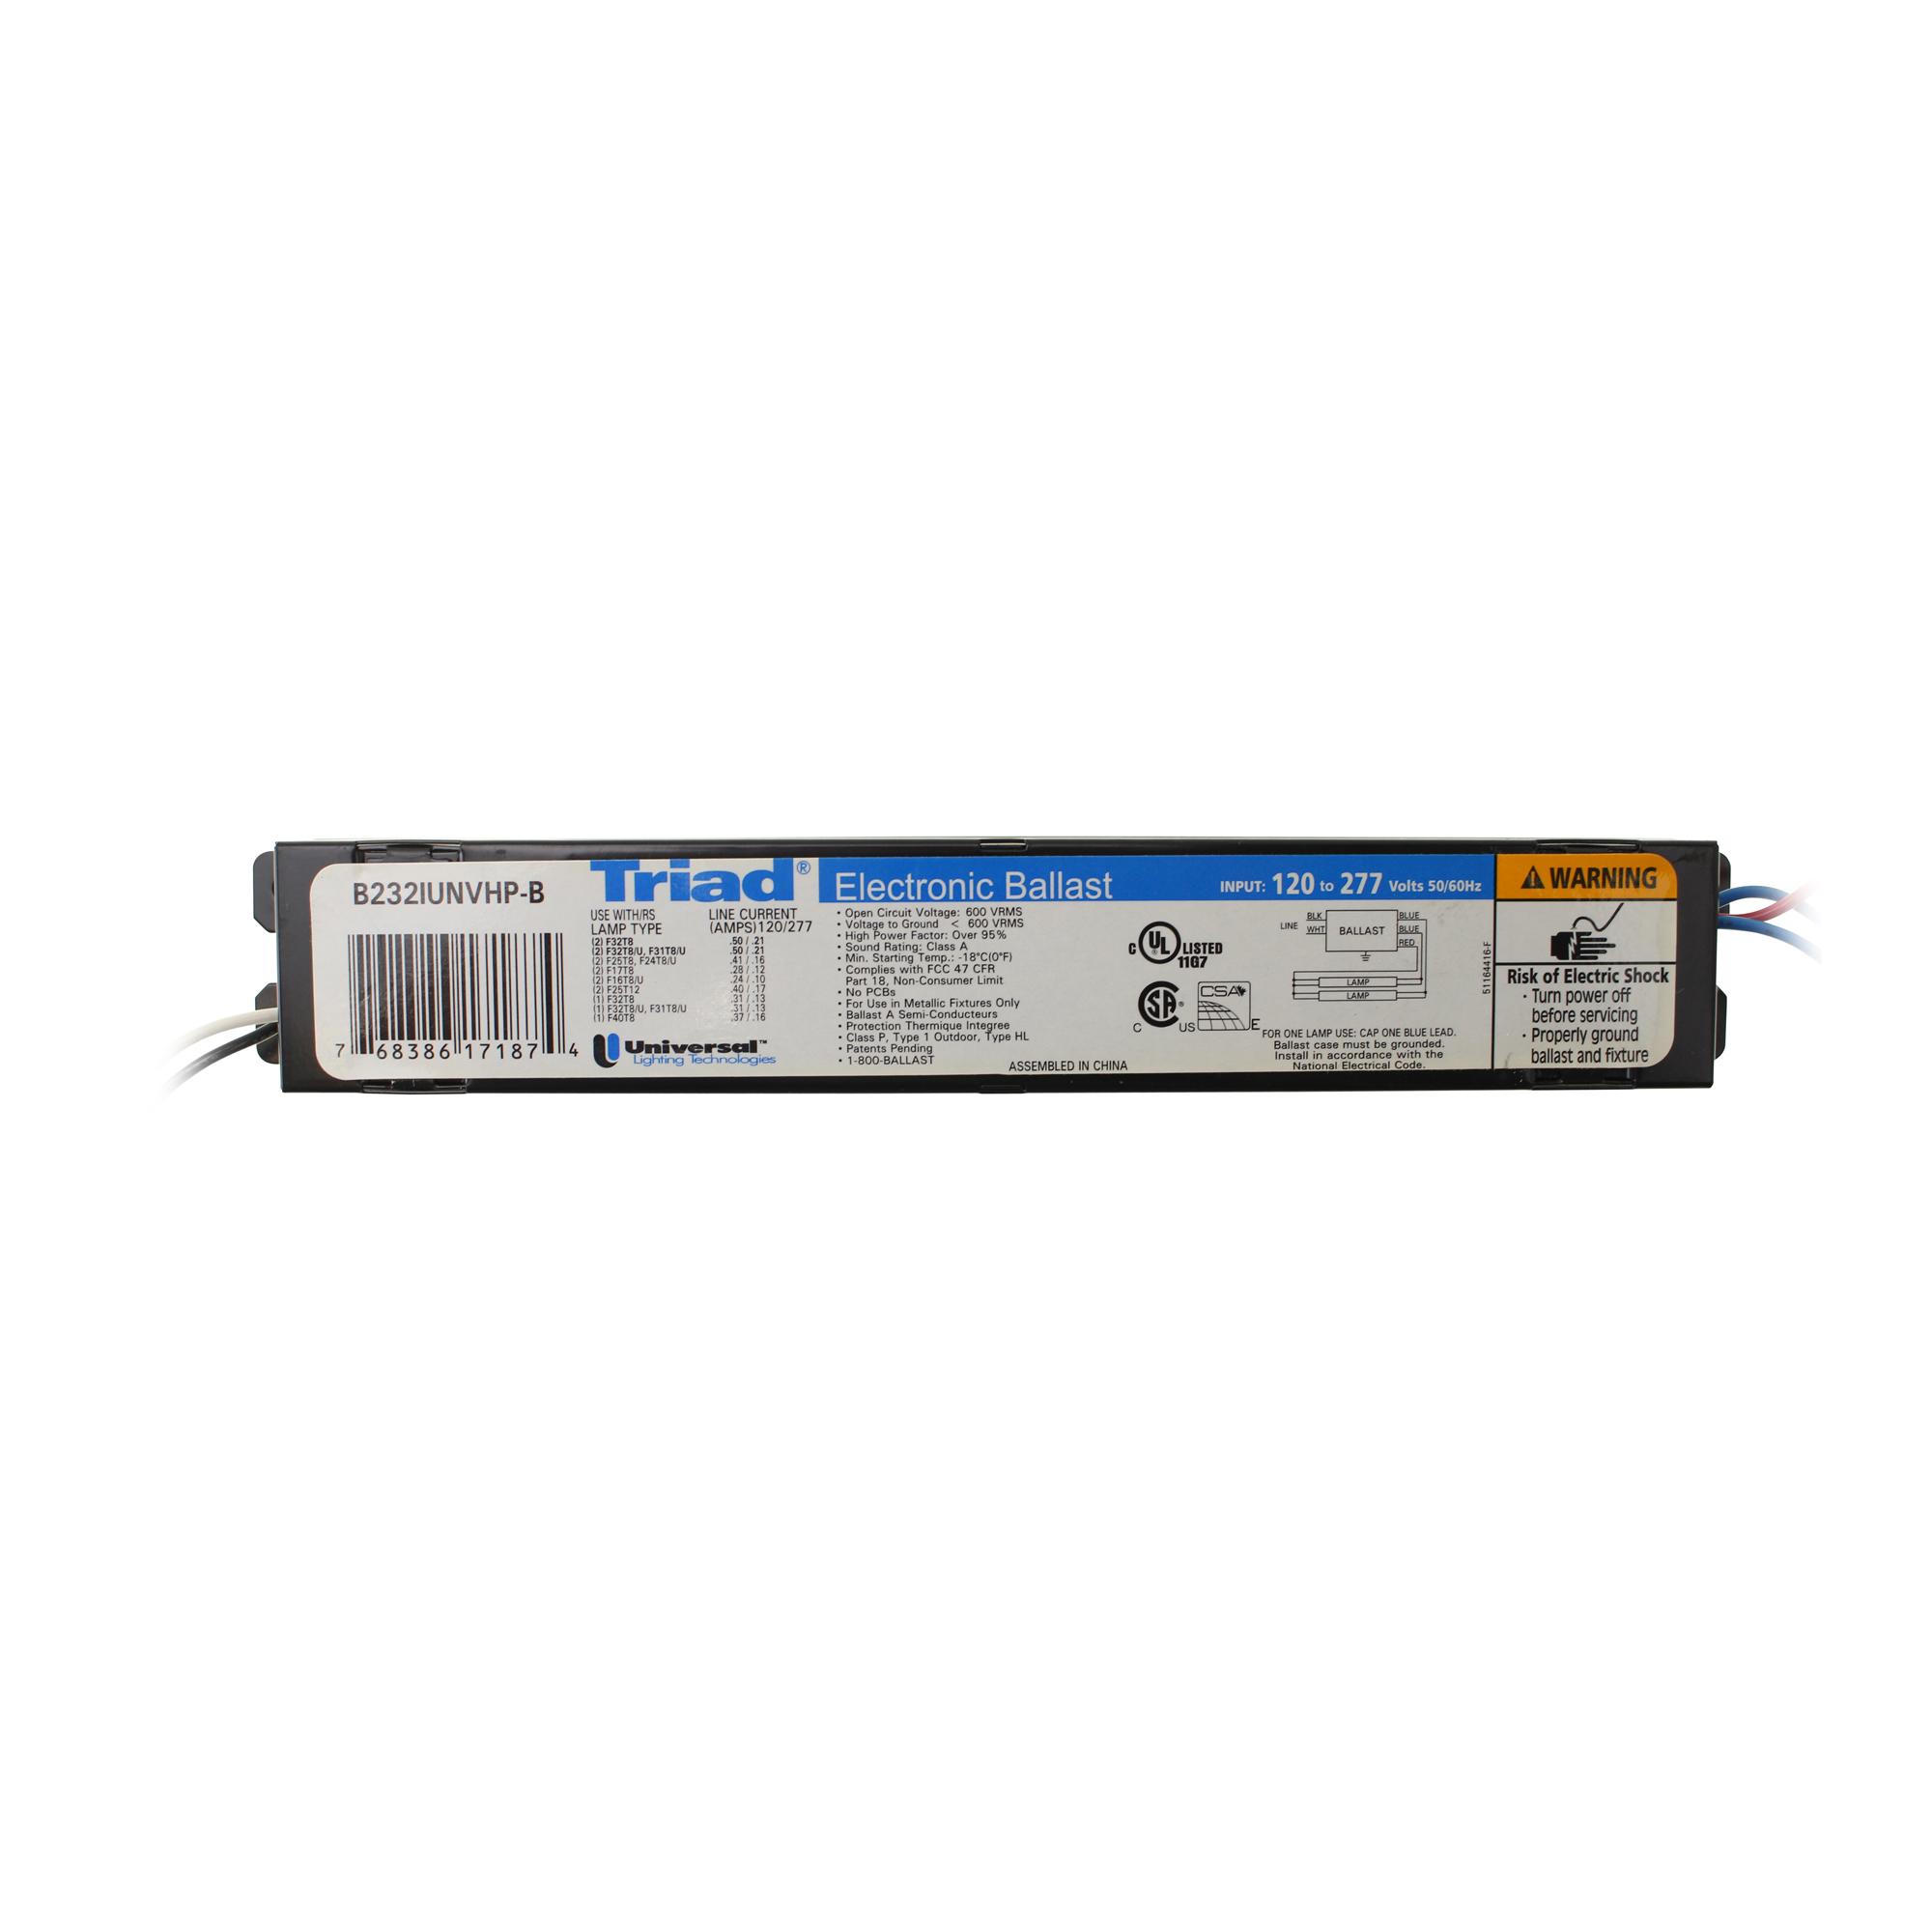 B232IUNVHP-N Universal Triad® Electronic Fluorescent Ballast 120-277 Volts B3